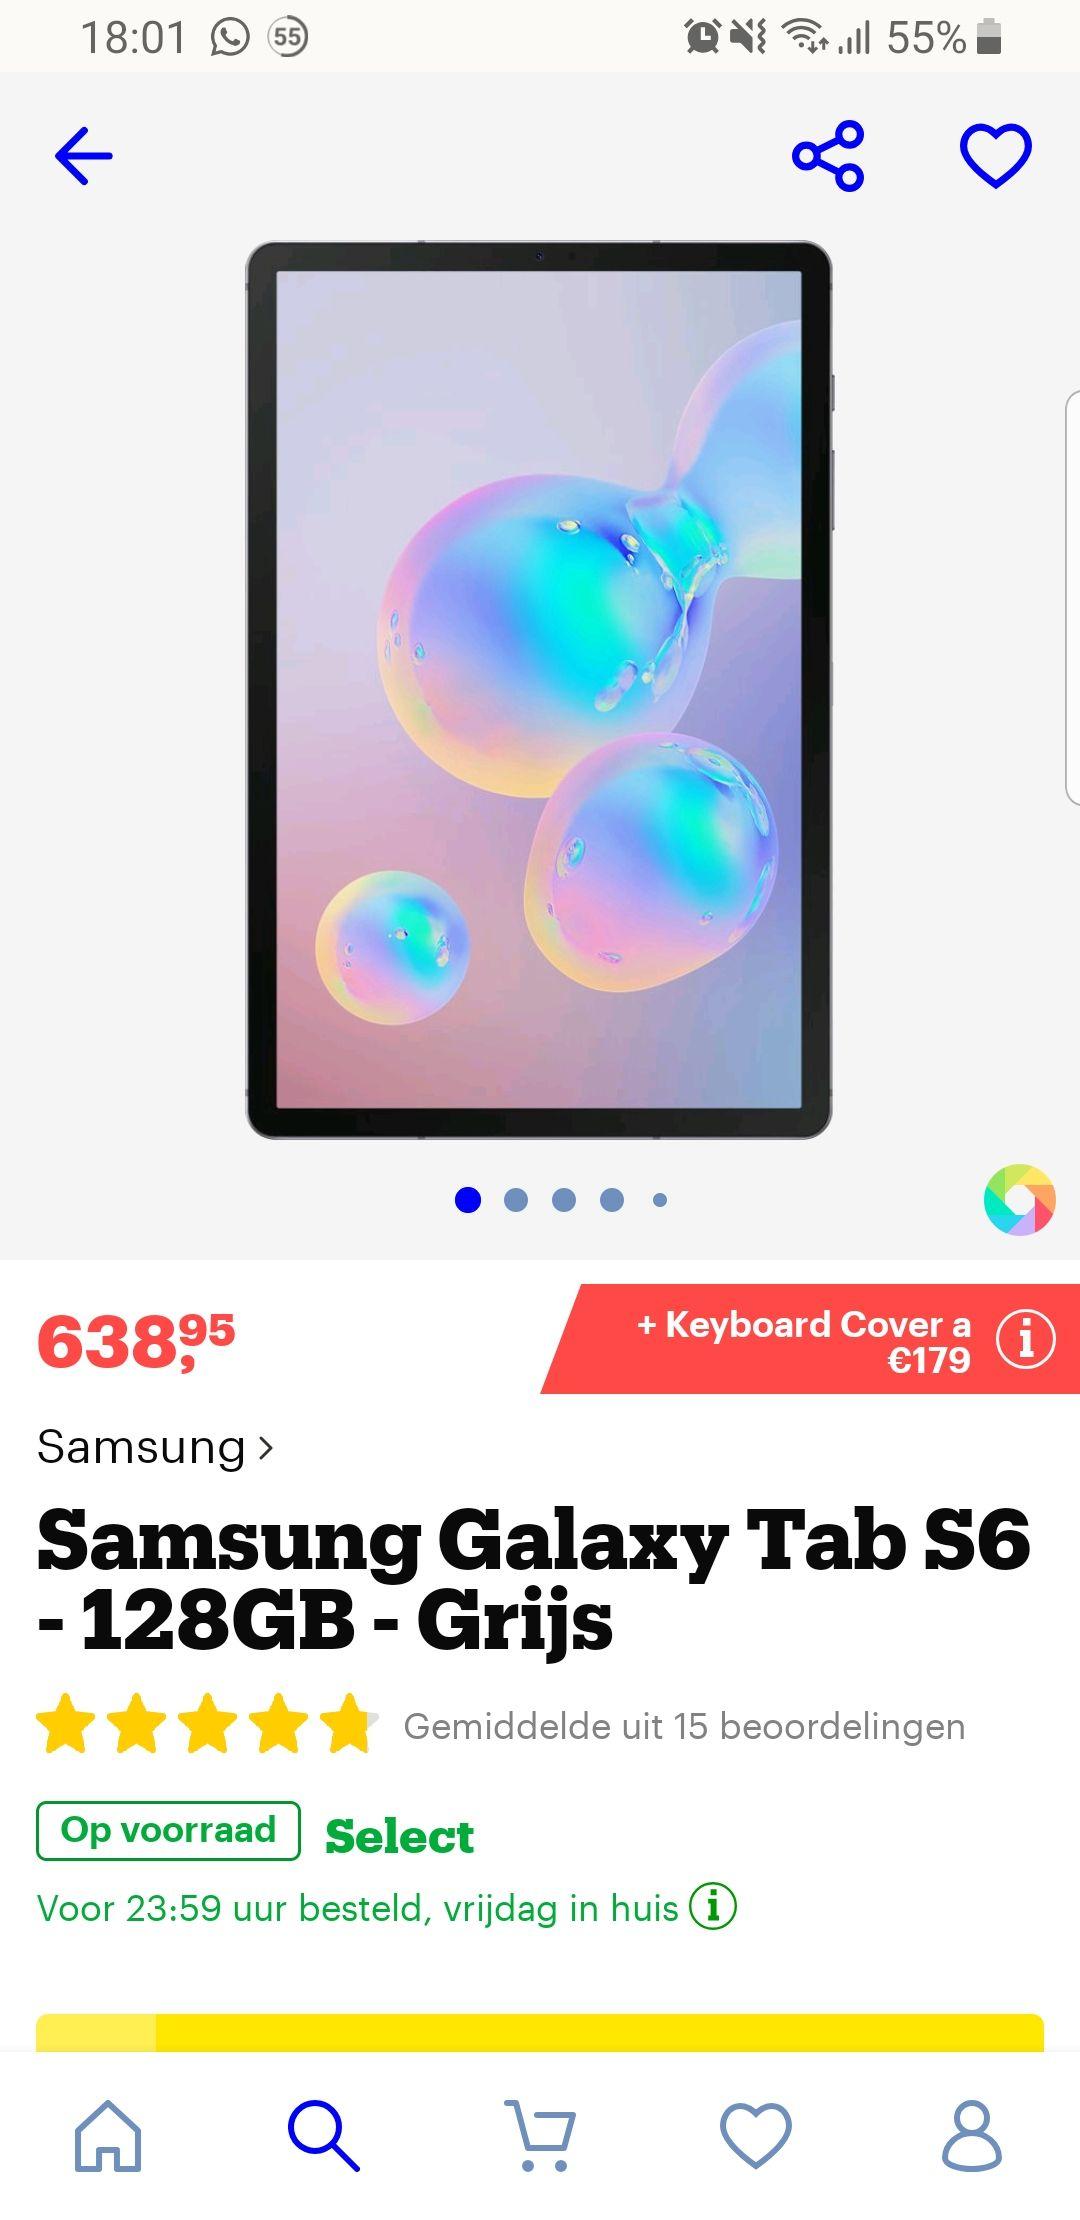 NU NOG LAGER: Samsung Galaxy Tab S6 + gratis typecover twv €179,-